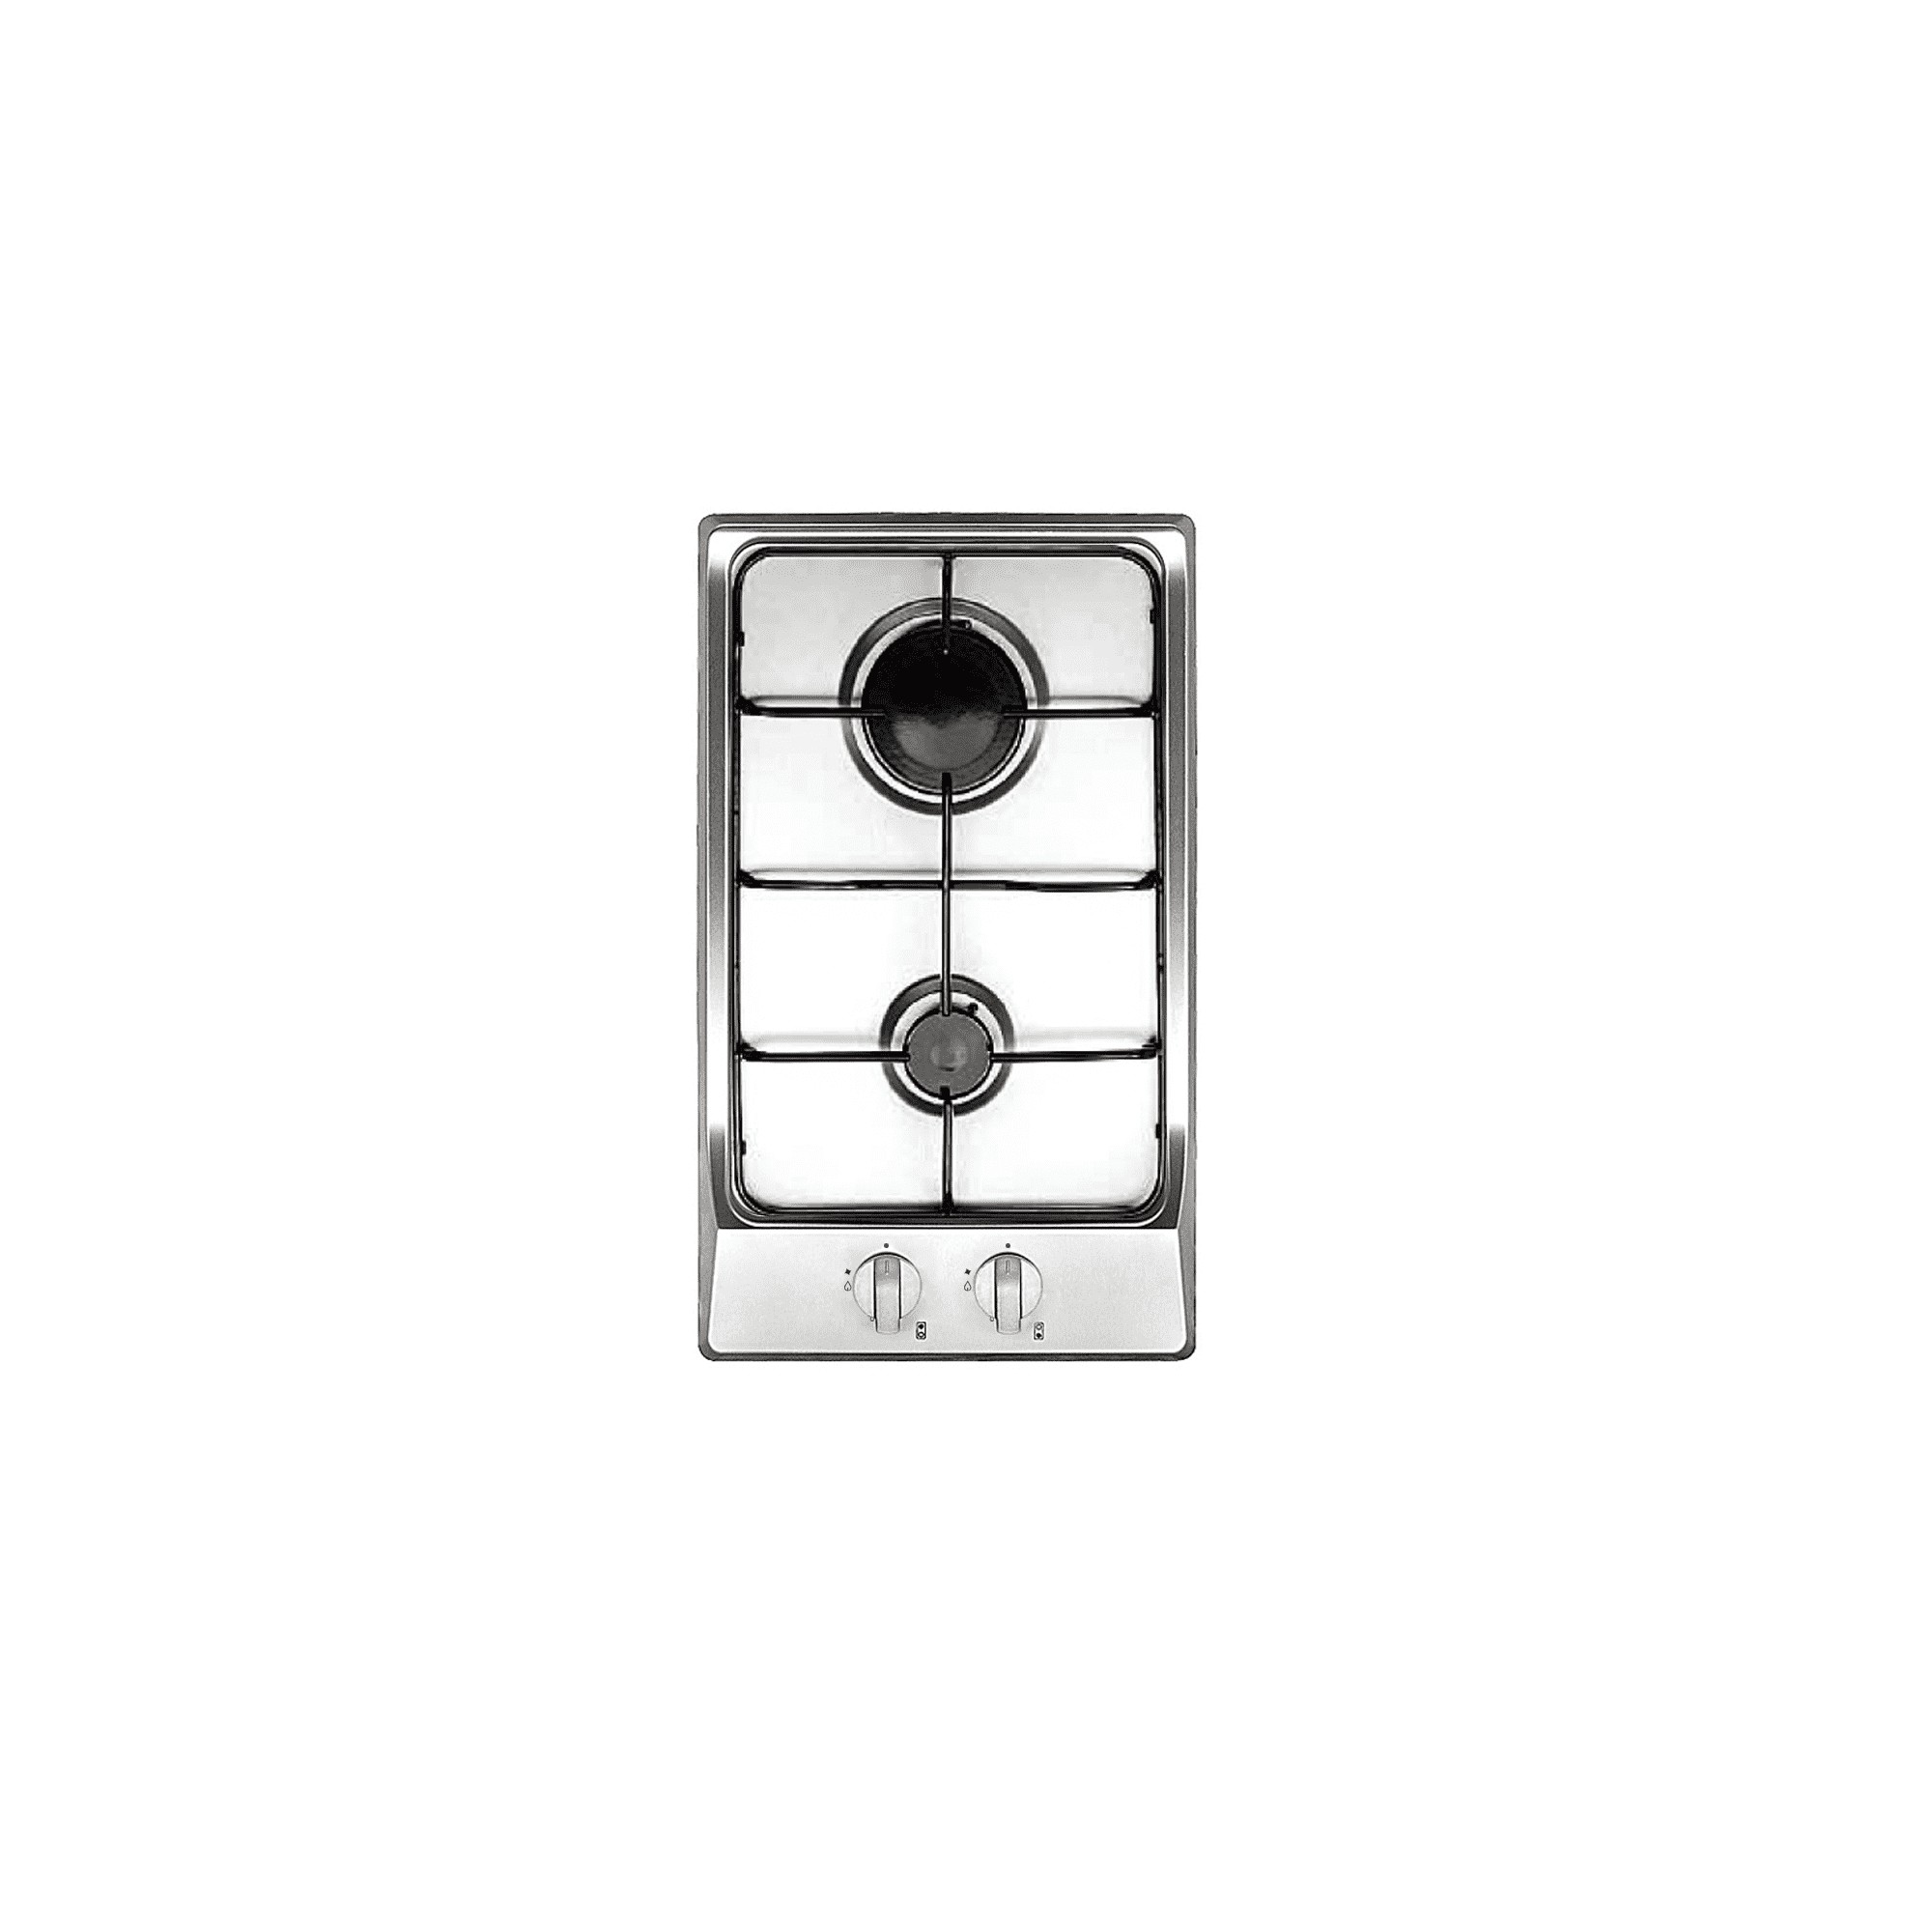 http://www.bbplace.fr/247-700-thickbox/domino-gaz-curtiss-encastrable-2-foyers.jpg